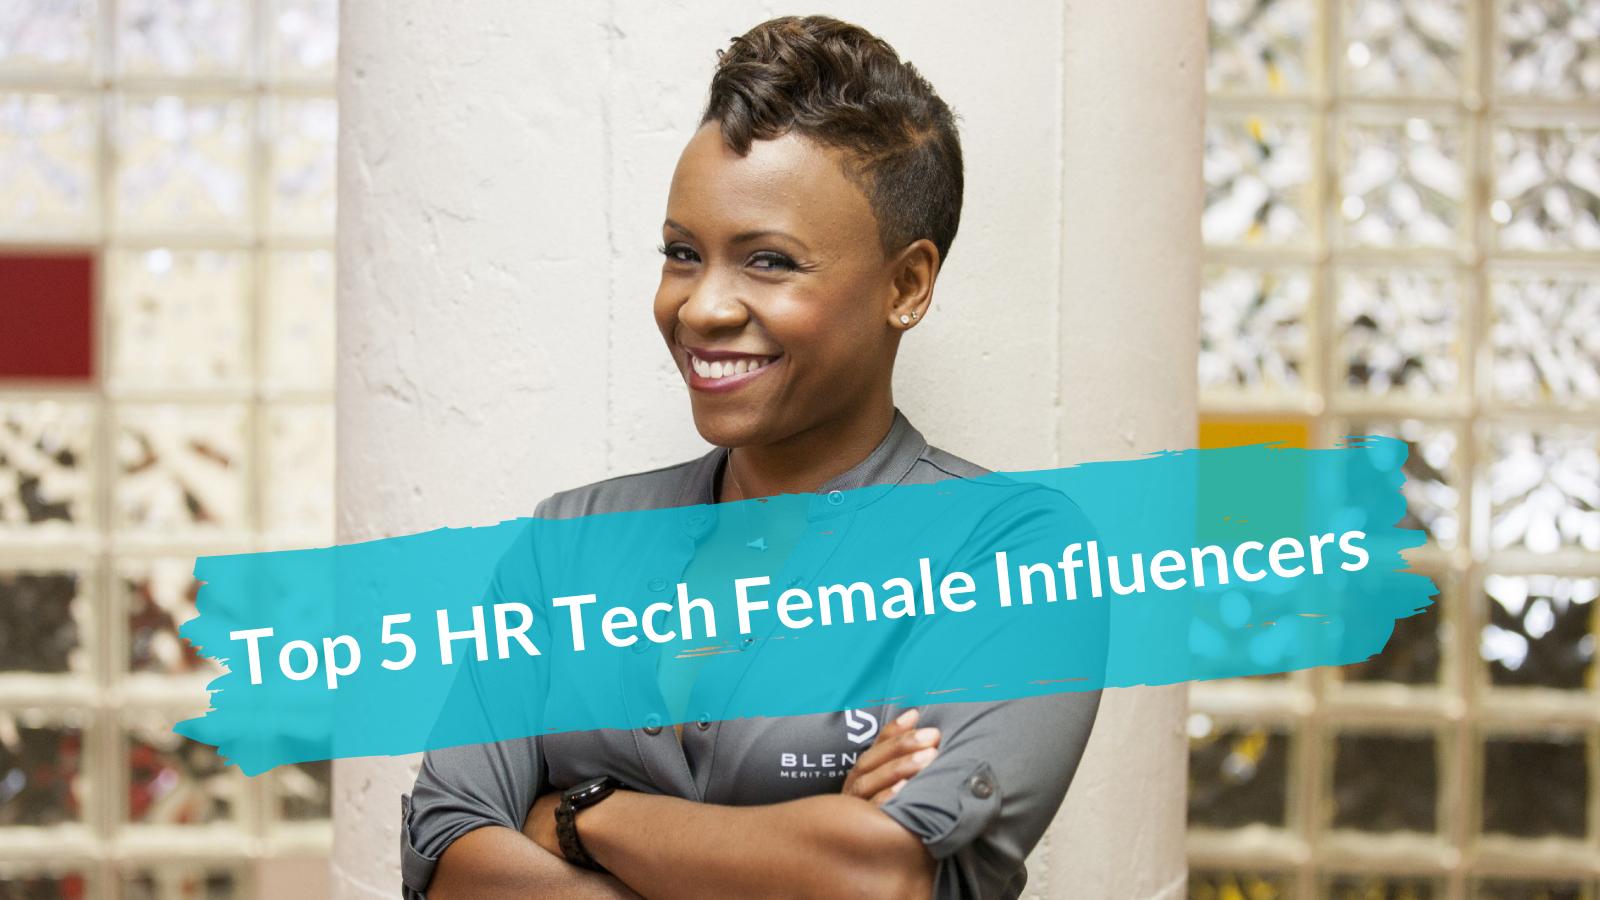 0 Top 5 HR Tech Female Influencers